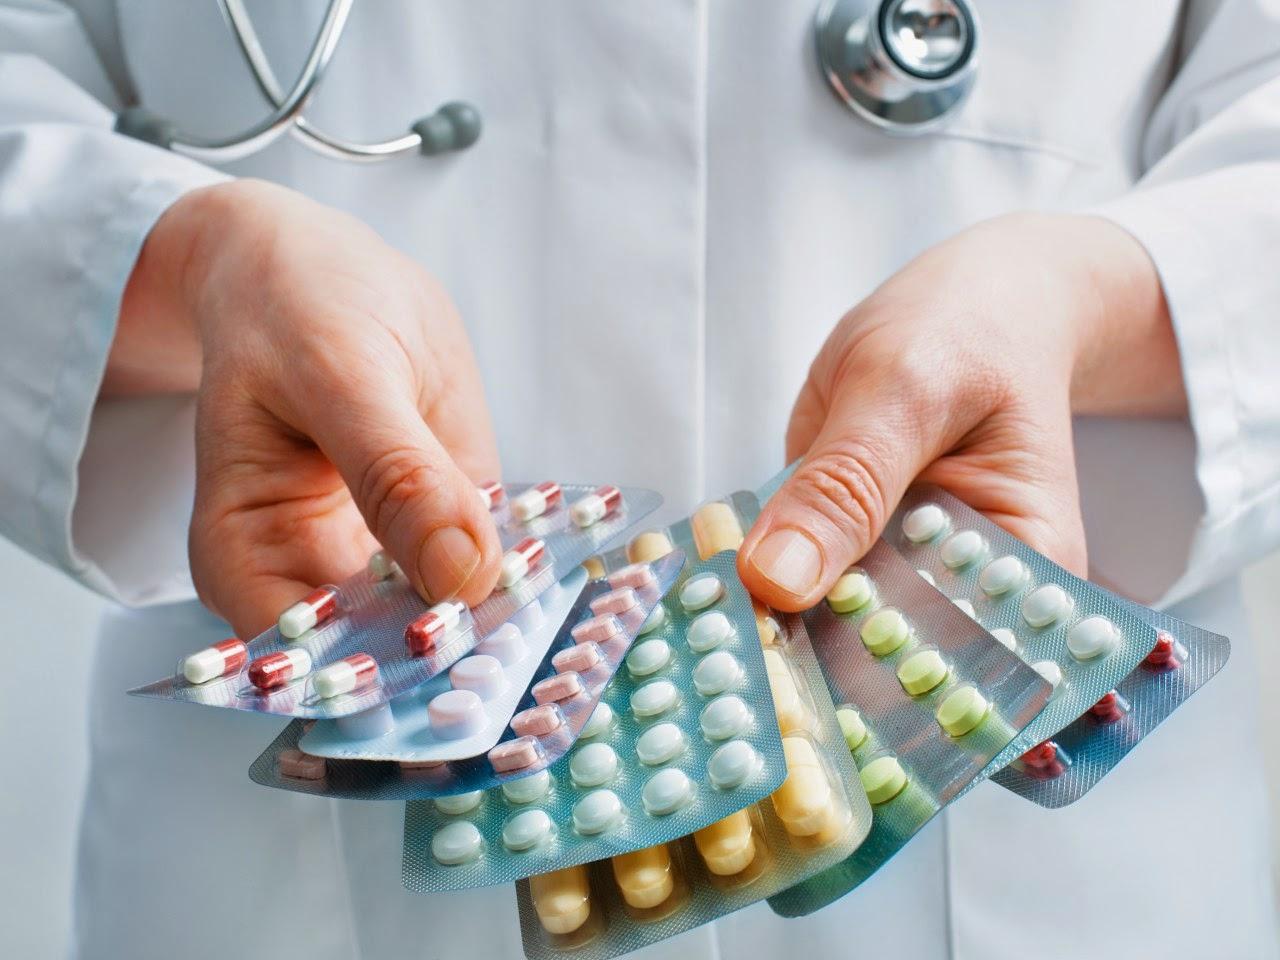 рекомендованы картинки к презентации о лекарствах те